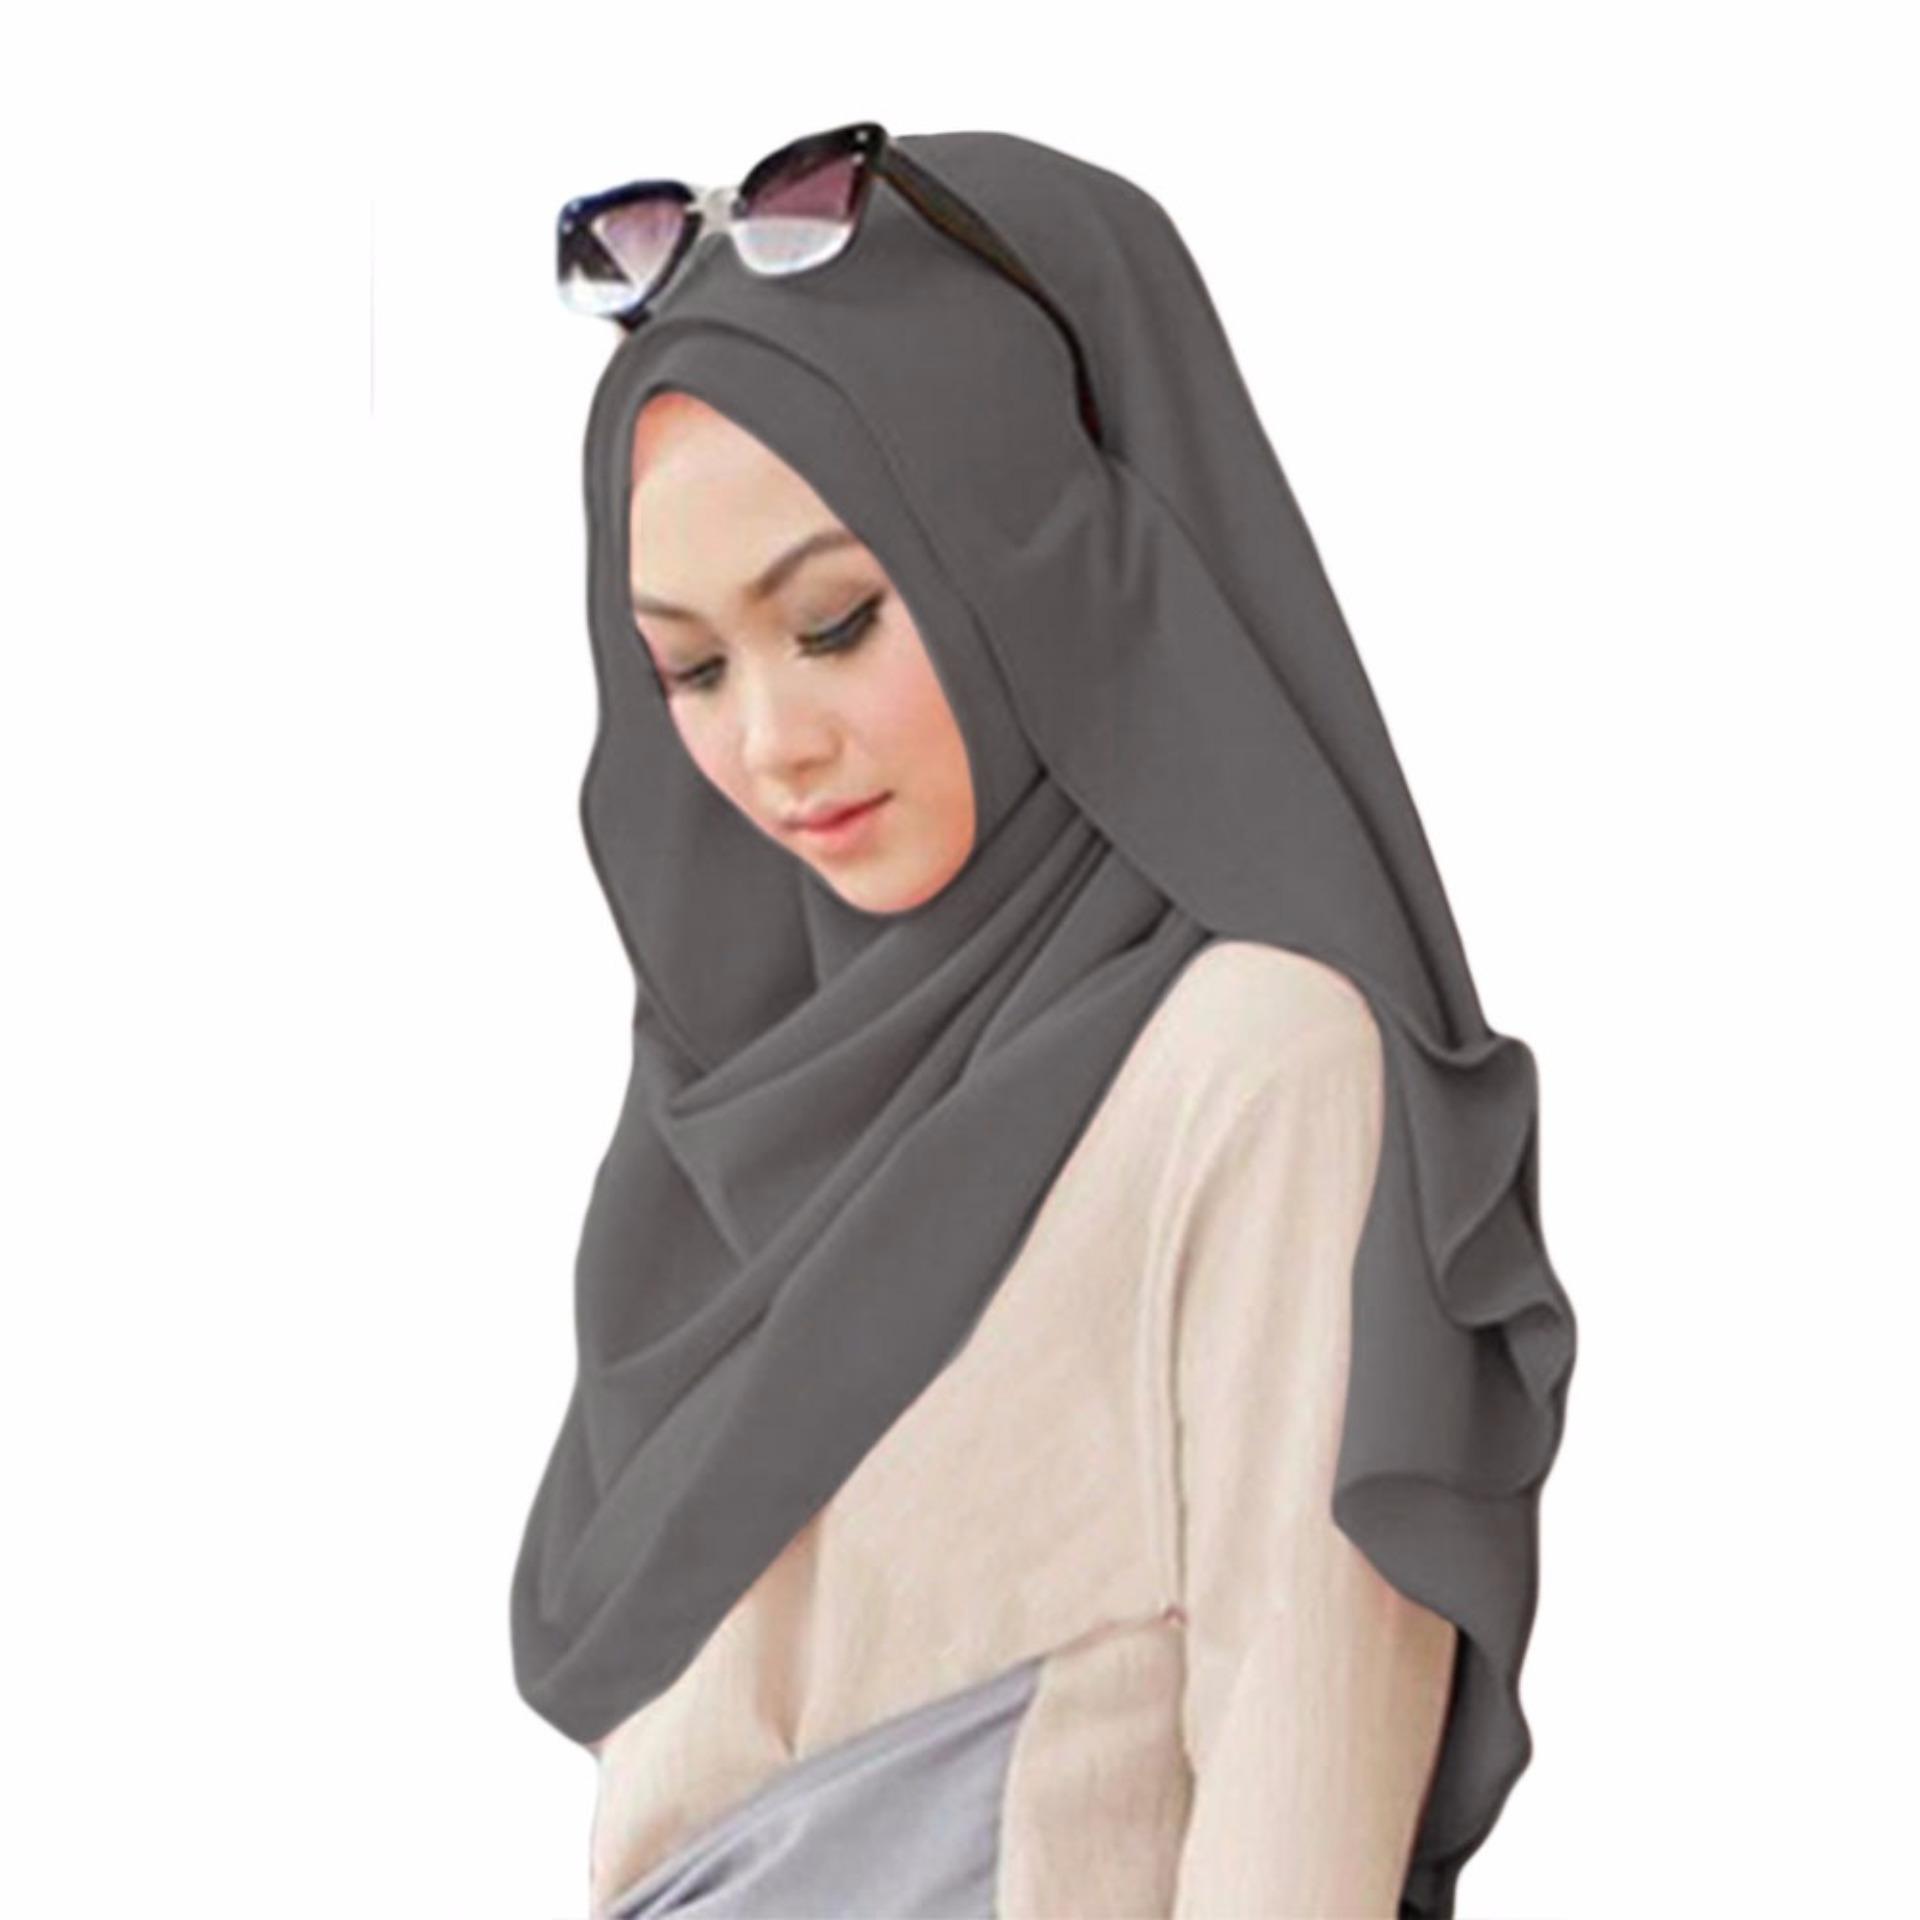 Belle Hijab Kerudung Instan - [Warna Abu Tua]